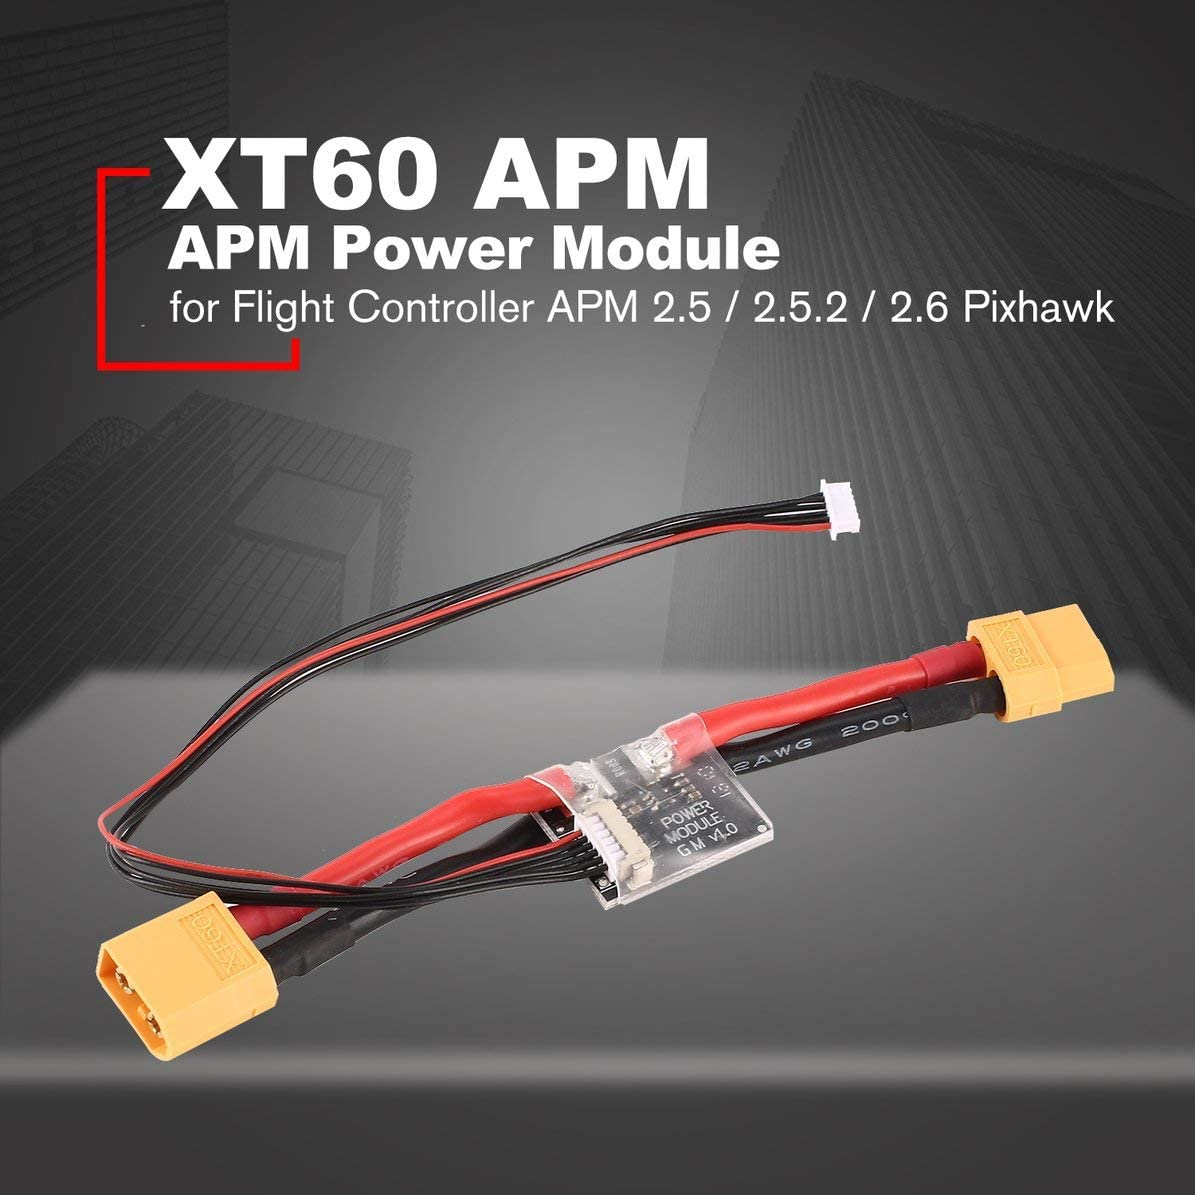 Connectors XT60 APM Power Module Board with DC 5.3V BEC for Flight Controller APM 2.5//2.5.2//2.6 Pixhawk Accessories